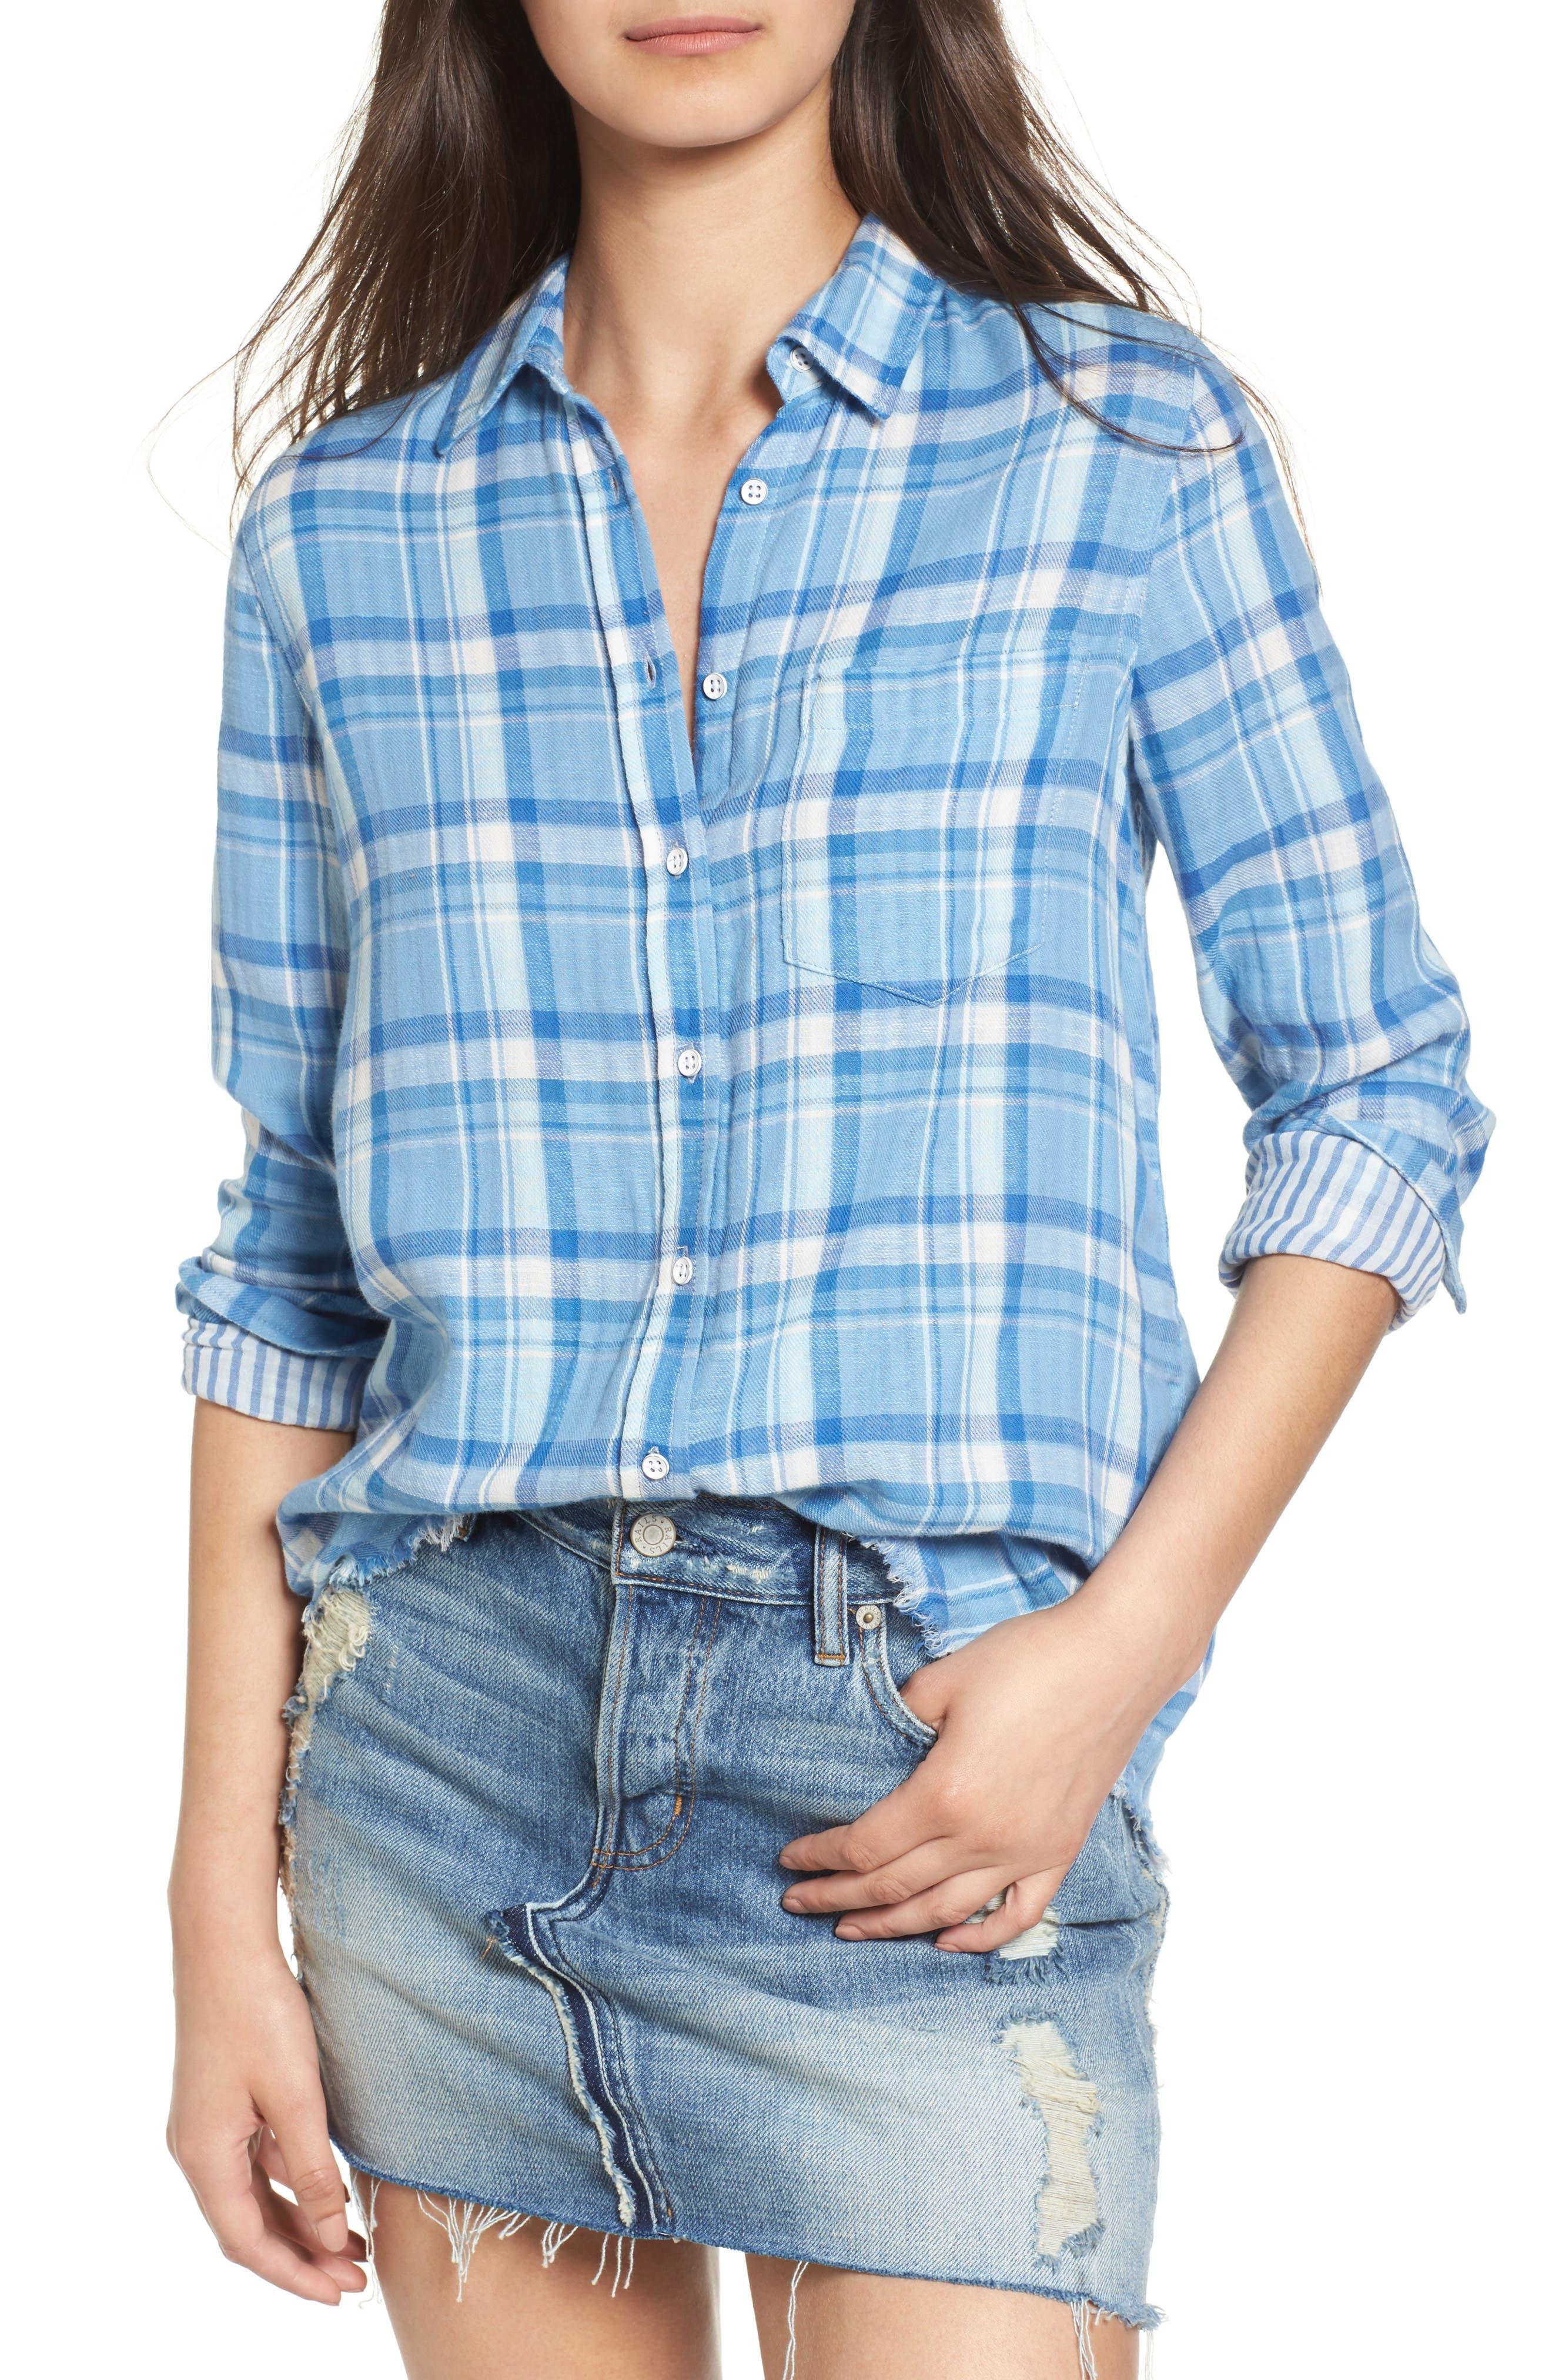 Main Image - DL1961 Mercer & Spring Frayed Shirt